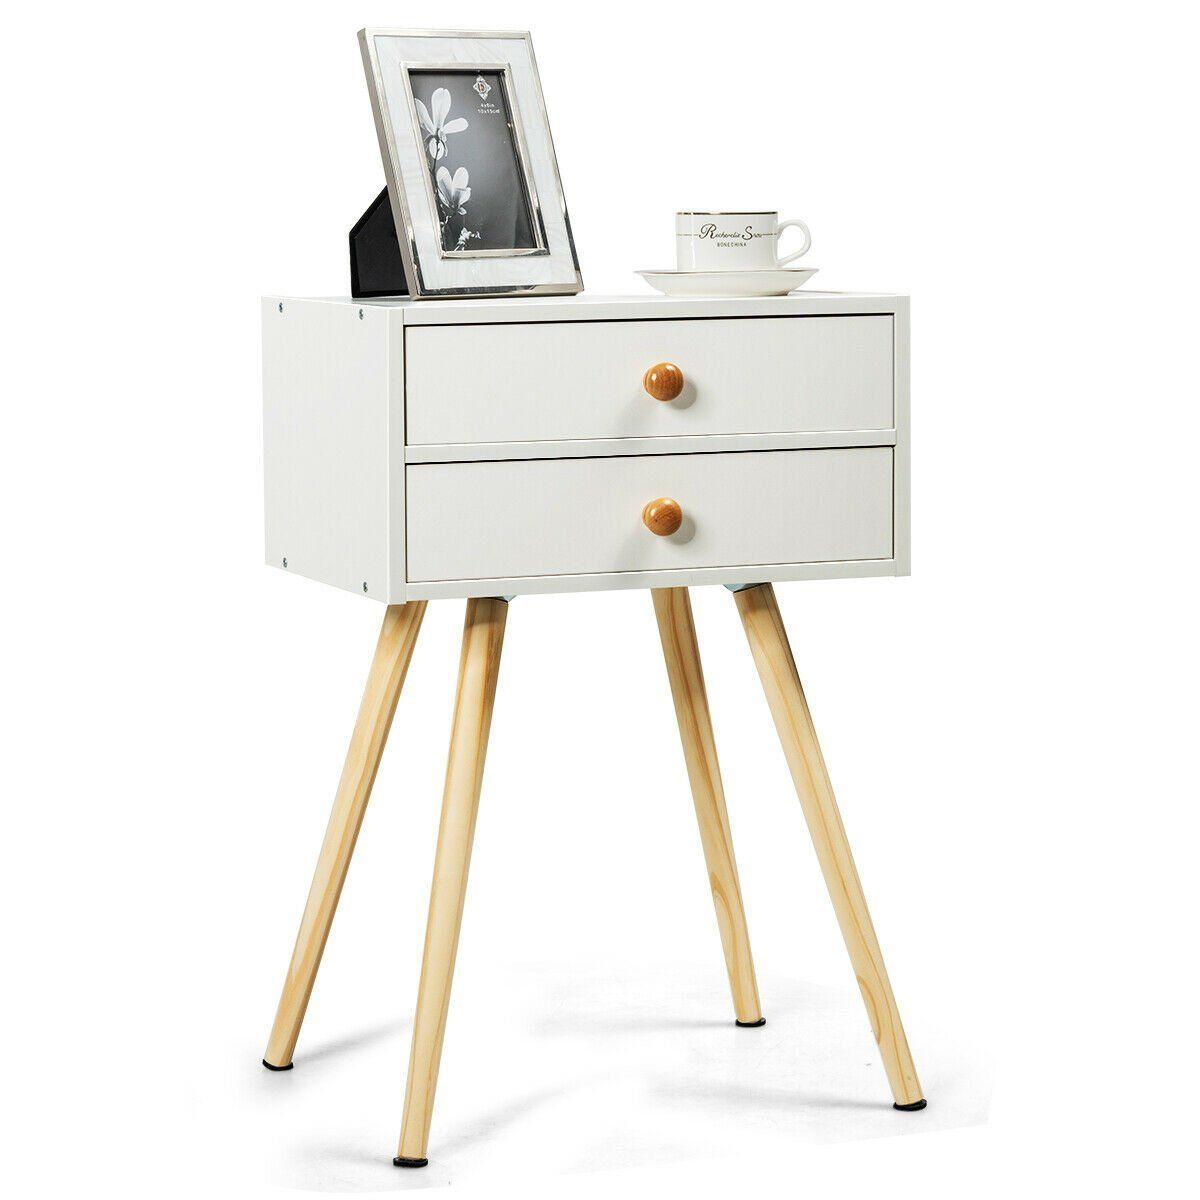 Mid Century Modern 2 Drawers Nightstand in Natural#century #drawers #mid #modern #natural #nightstand